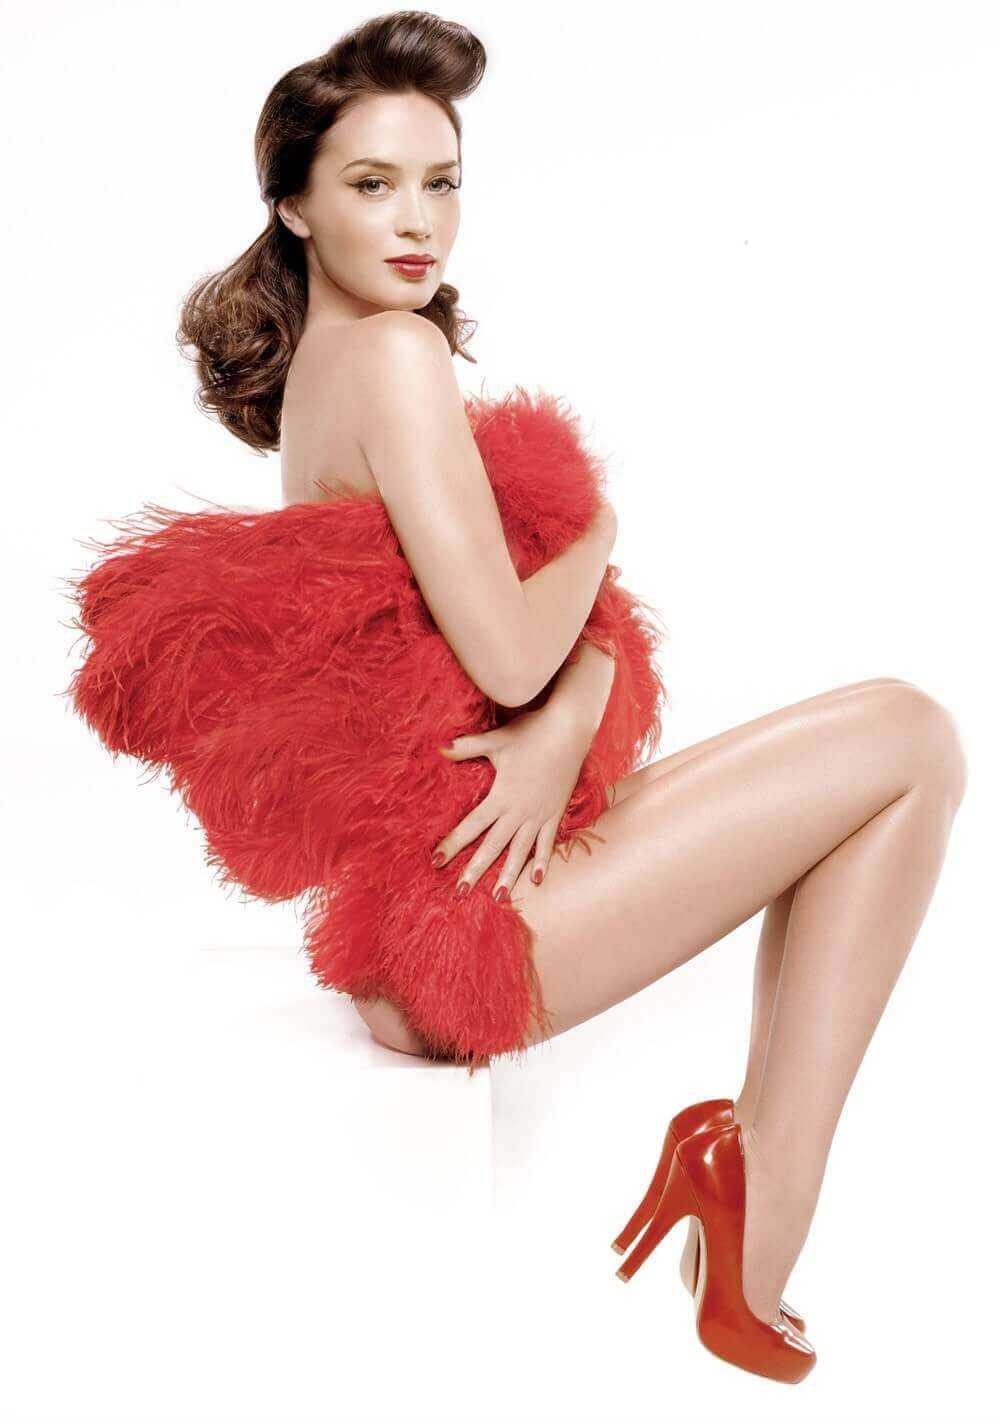 Emily Blunt Nude Pics